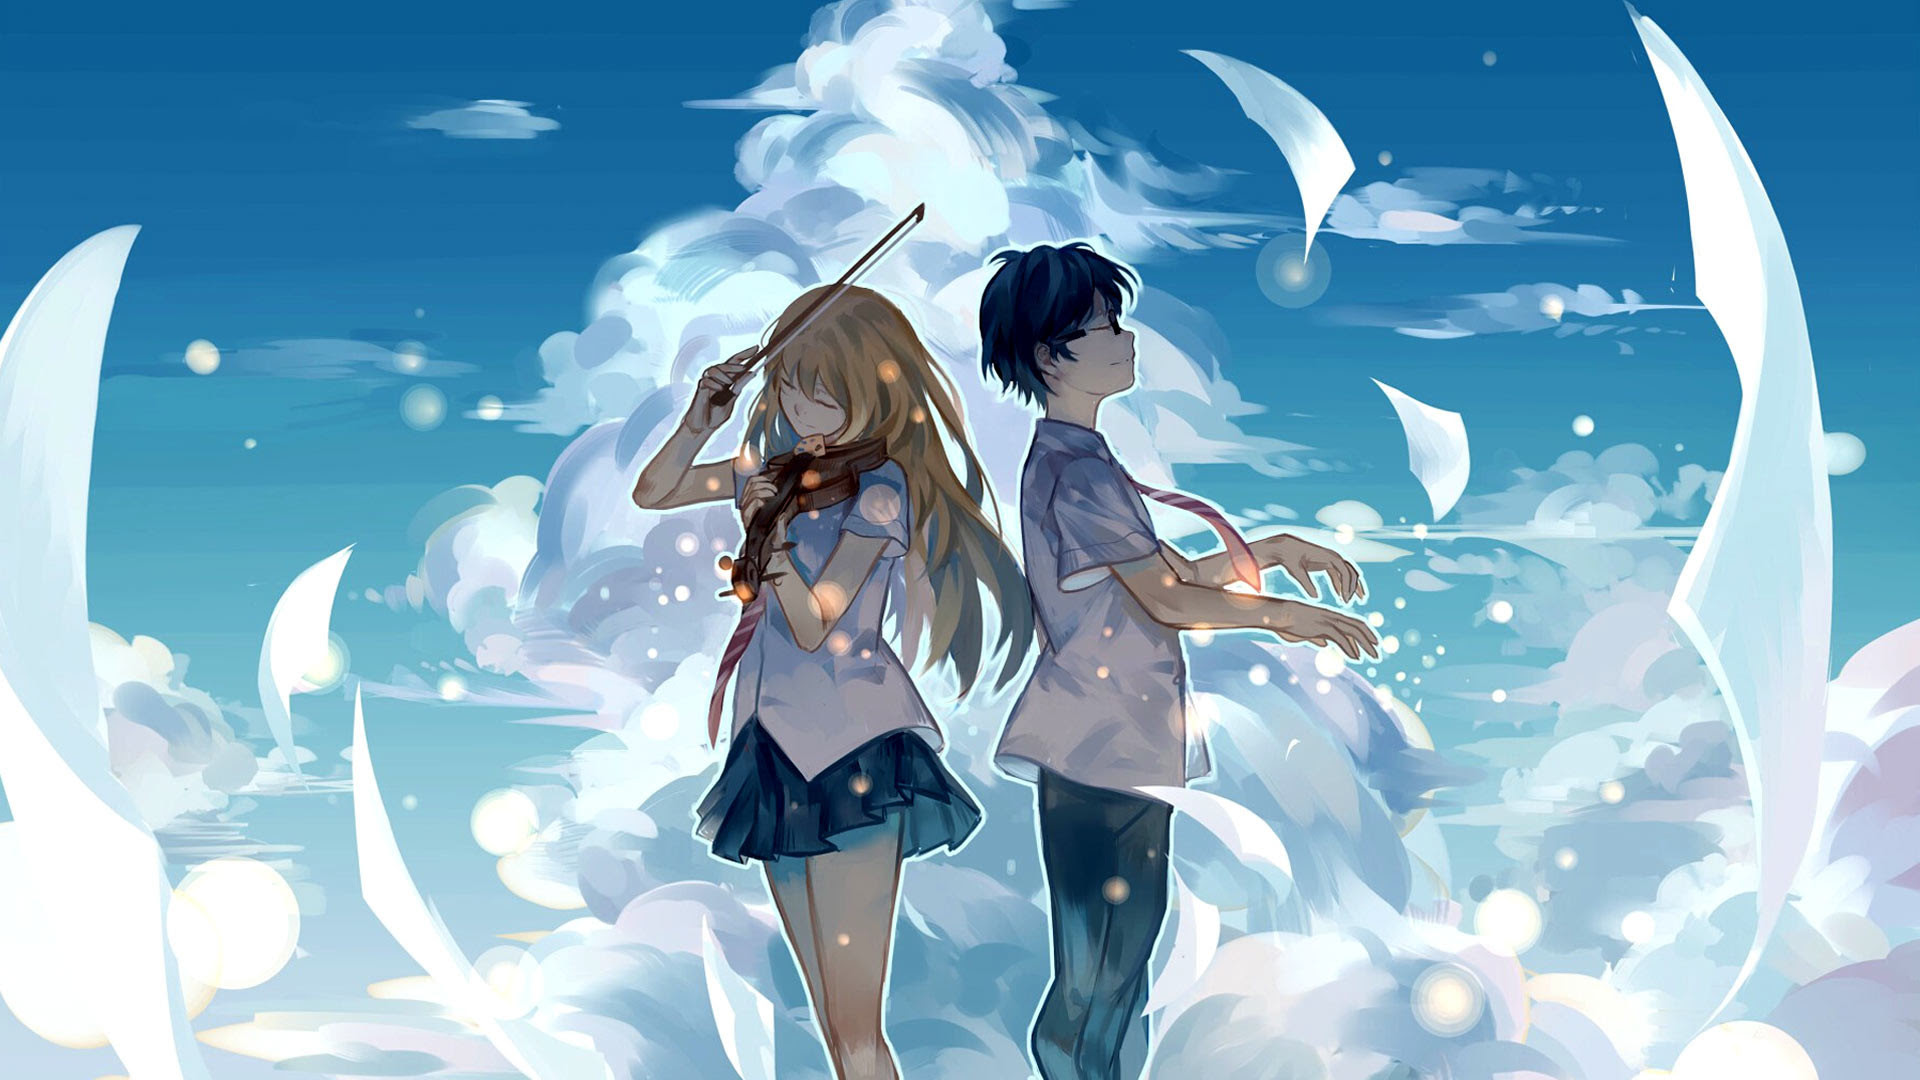 12 Desktop Anime Wallpaper 1080x1920 Orochi Wallpaper